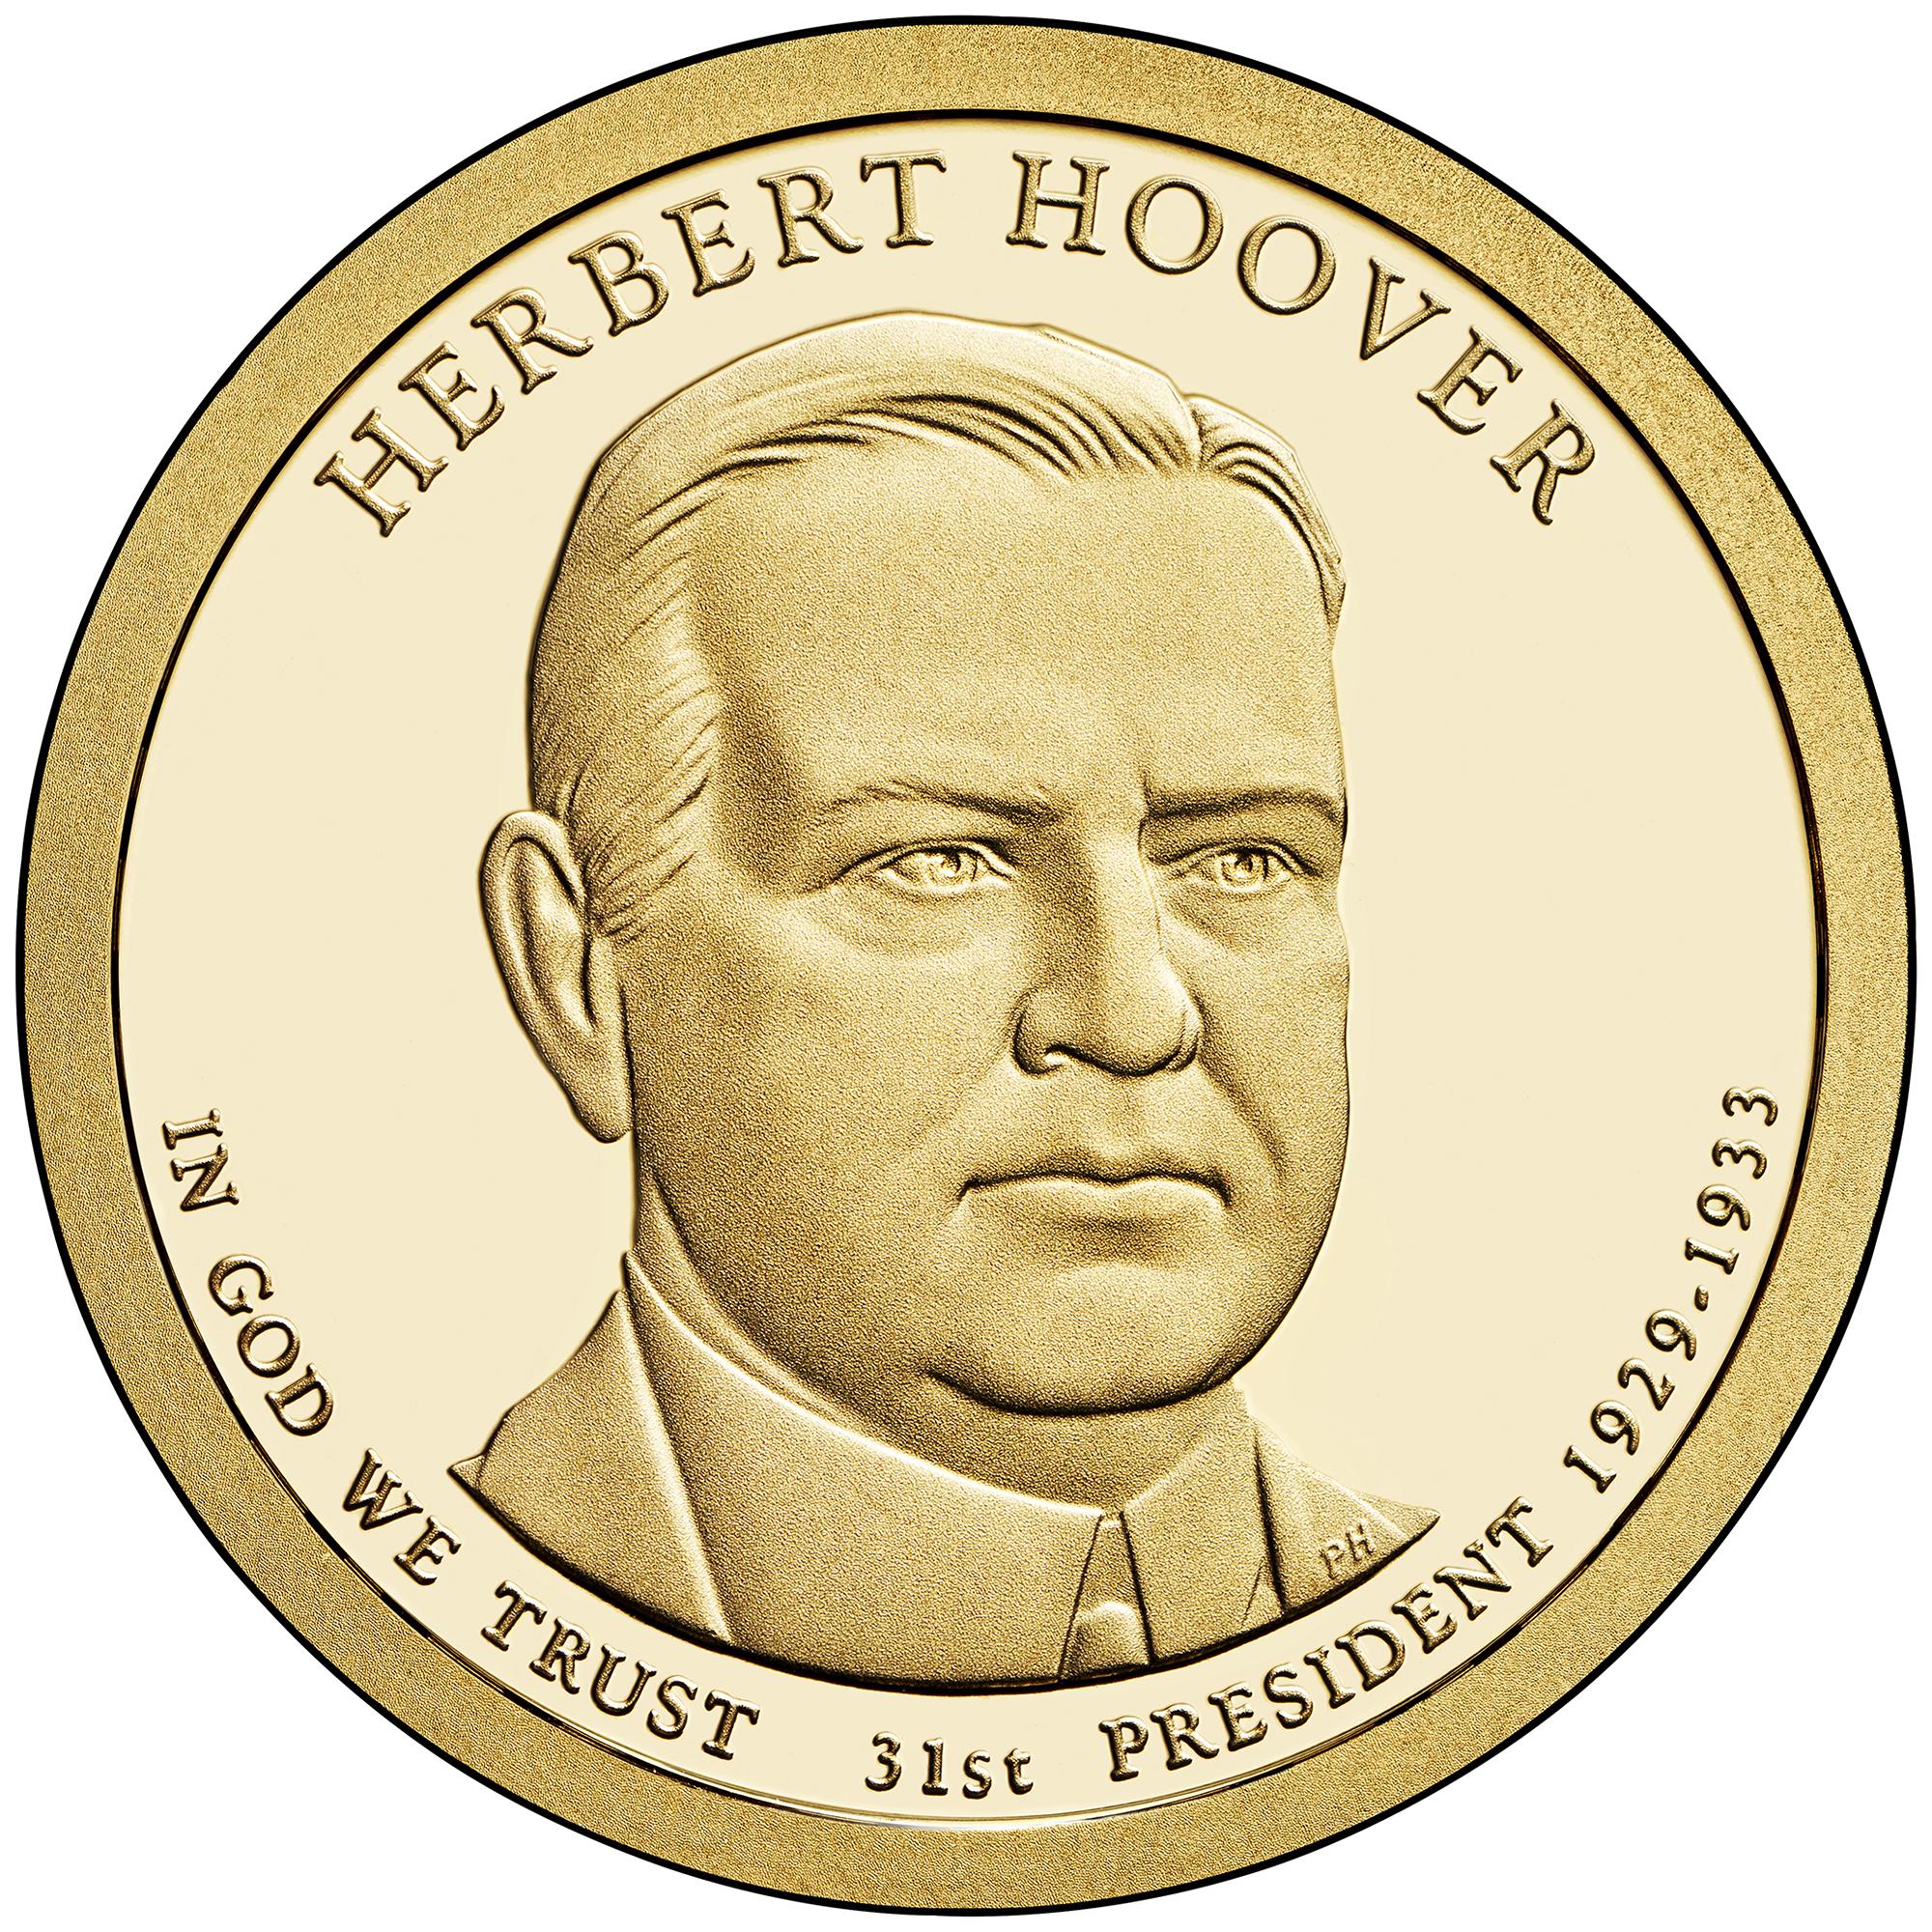 2014 Presidential Dollar Coin Herbert Hoover Proof Obverse